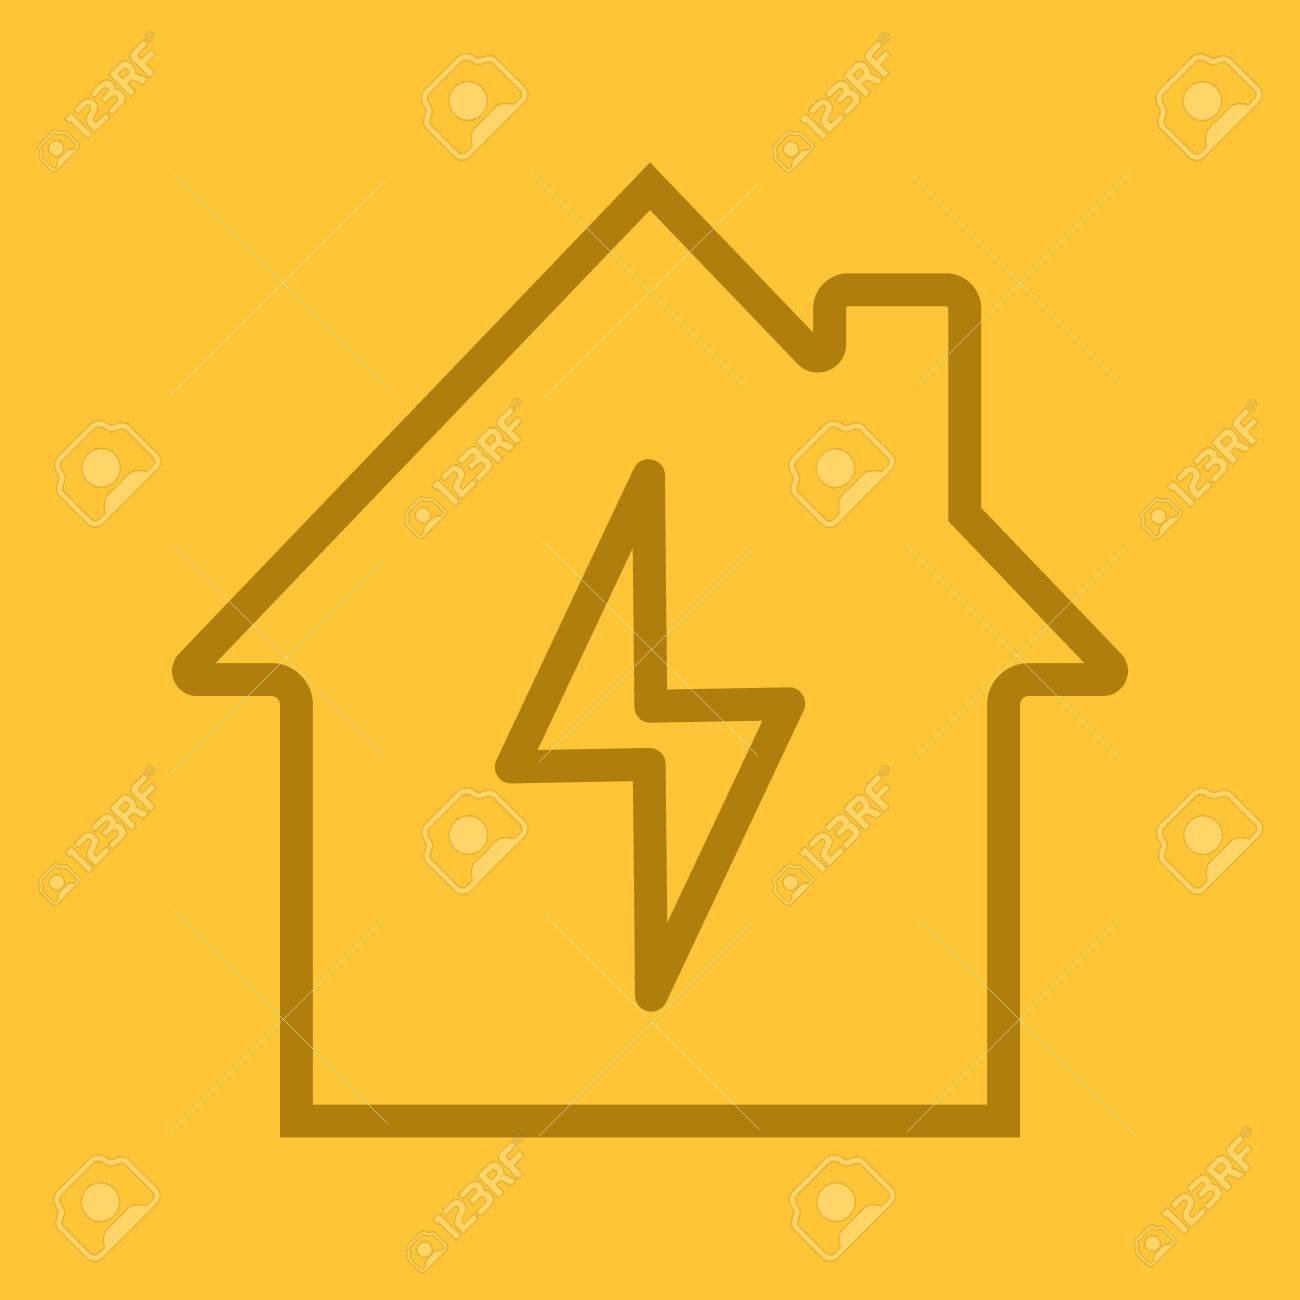 Home Elektrifizierung Linearen Symbol. Stromversorgungsunternehmen ...